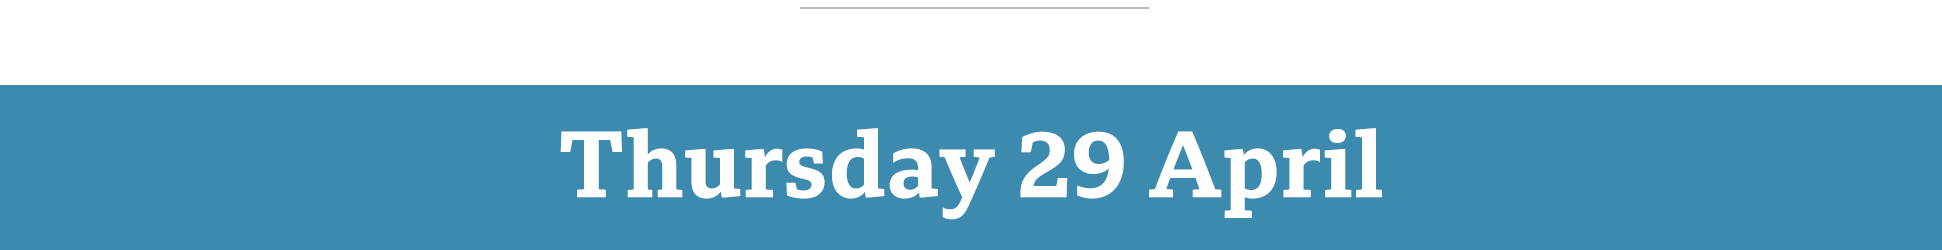 Thursday 29 April